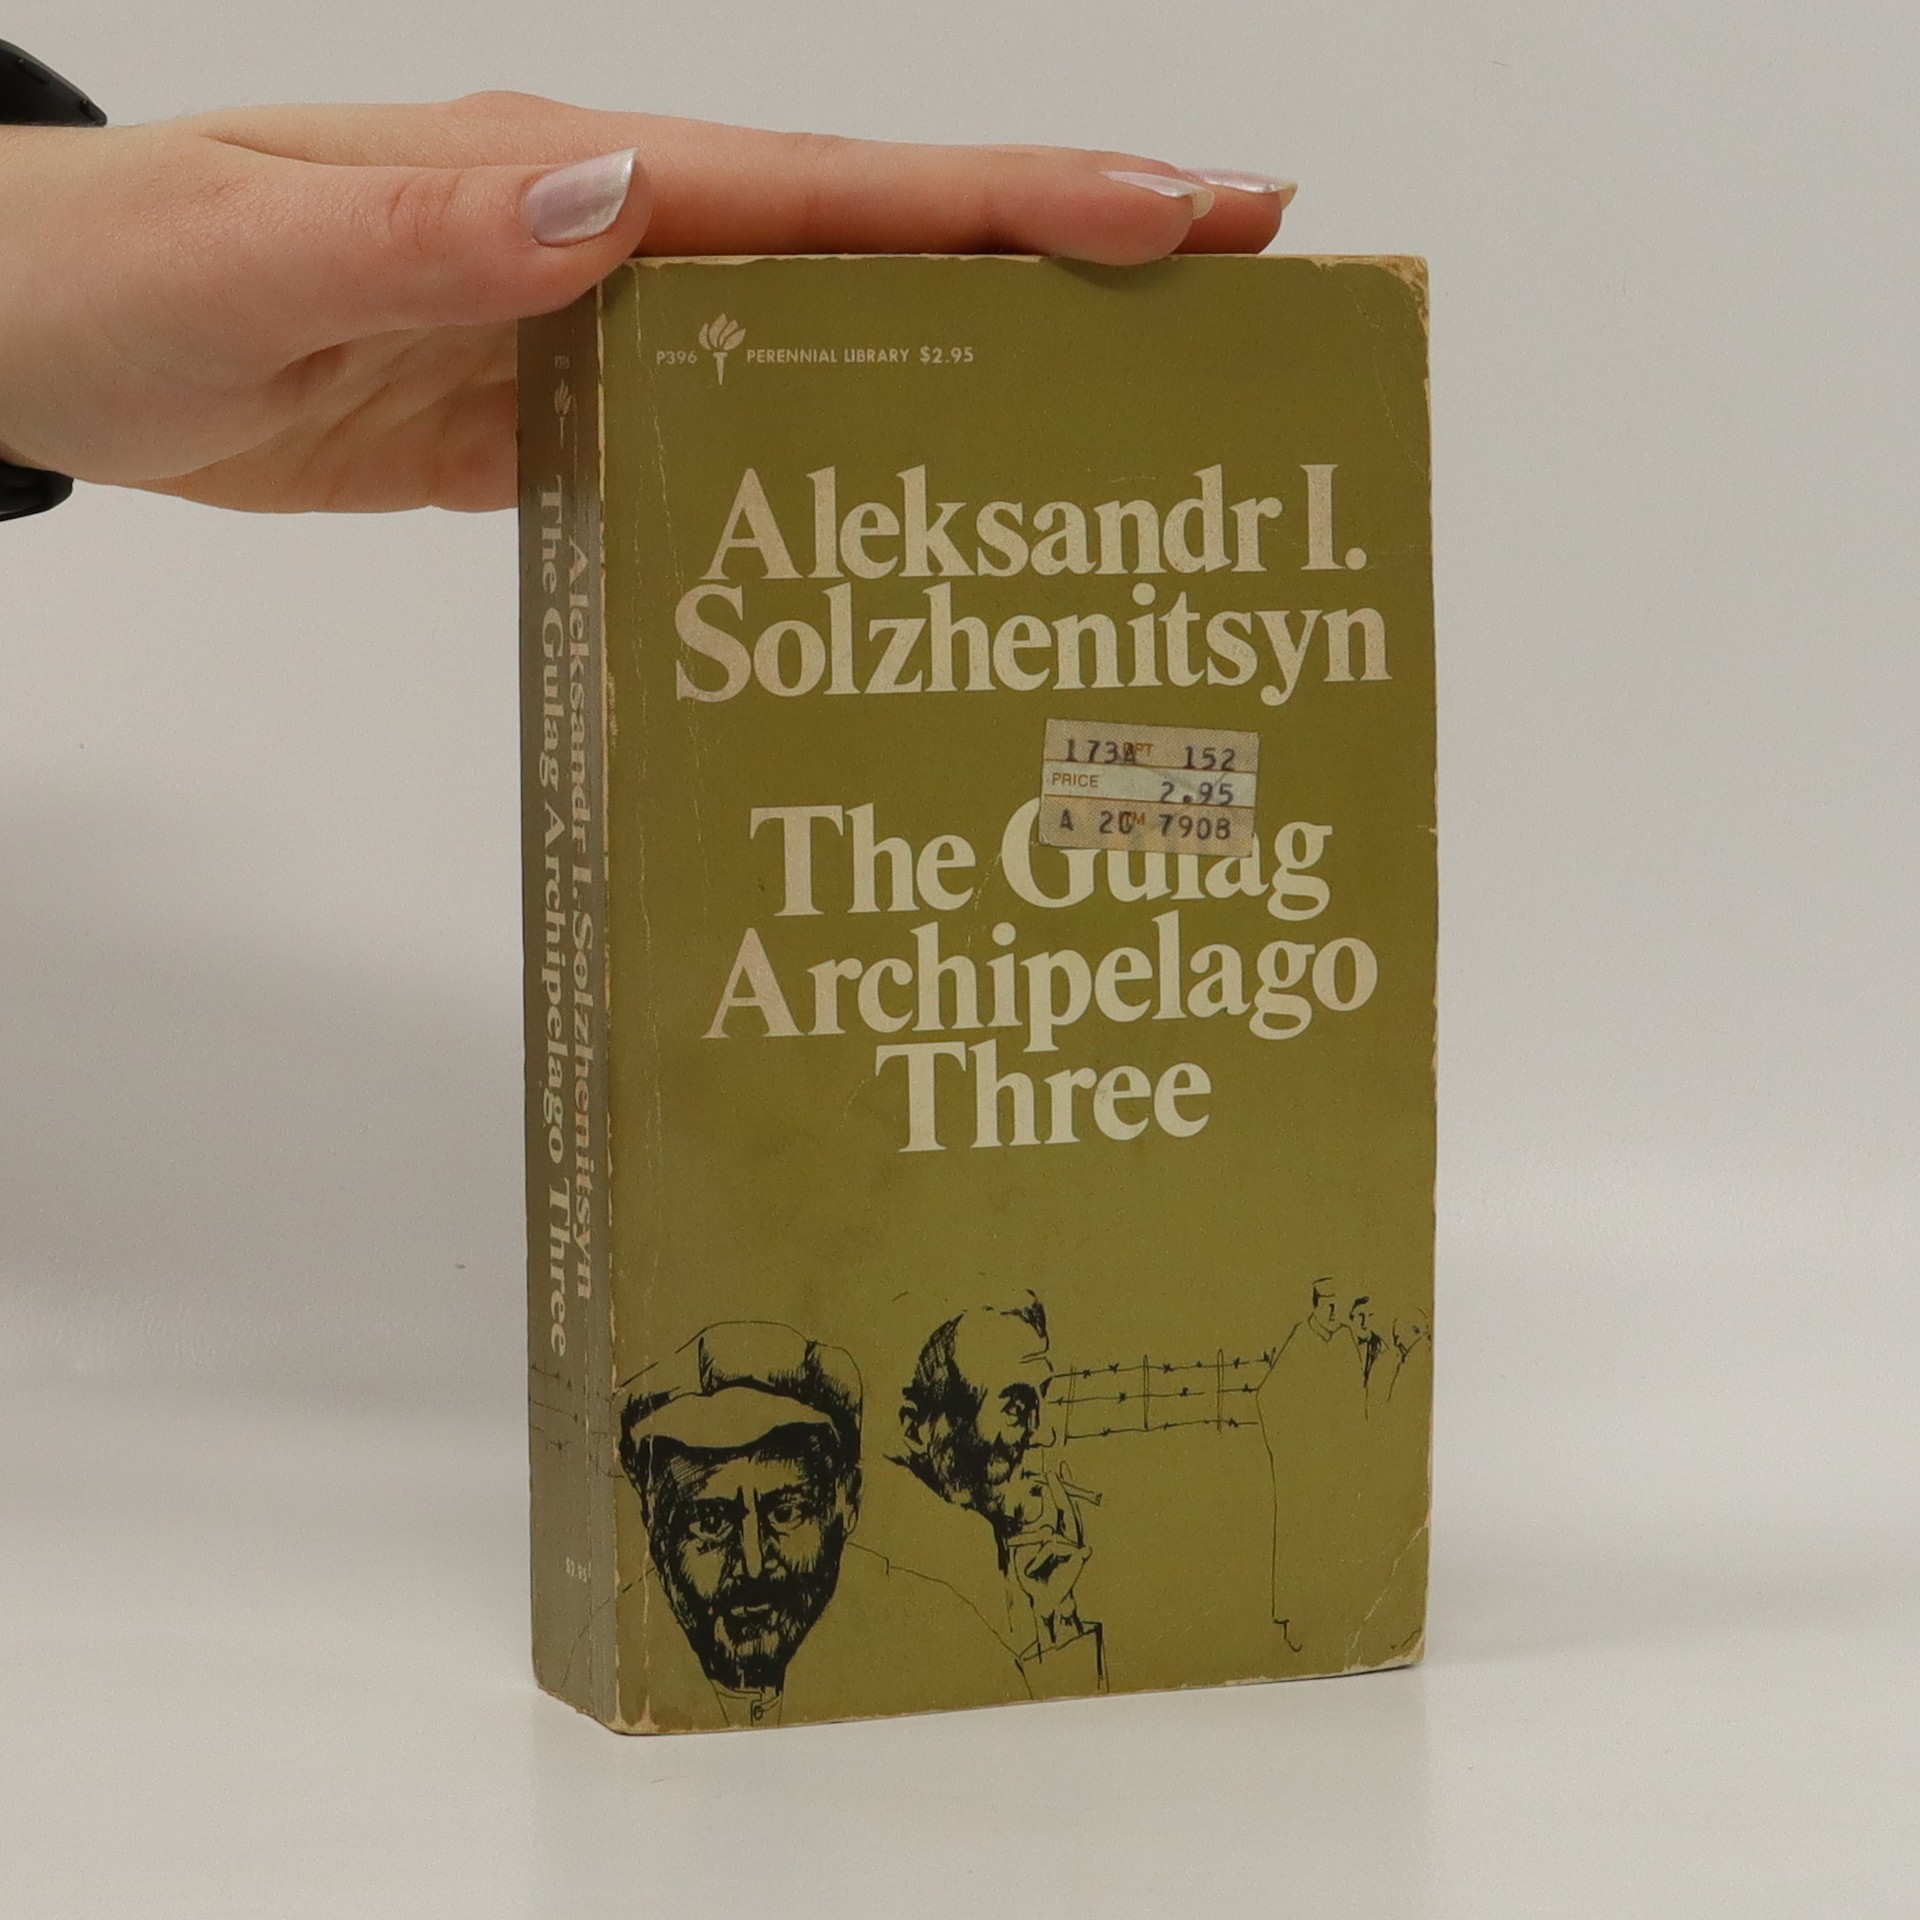 antikvární kniha The Gulag Archipelago Three, neuveden